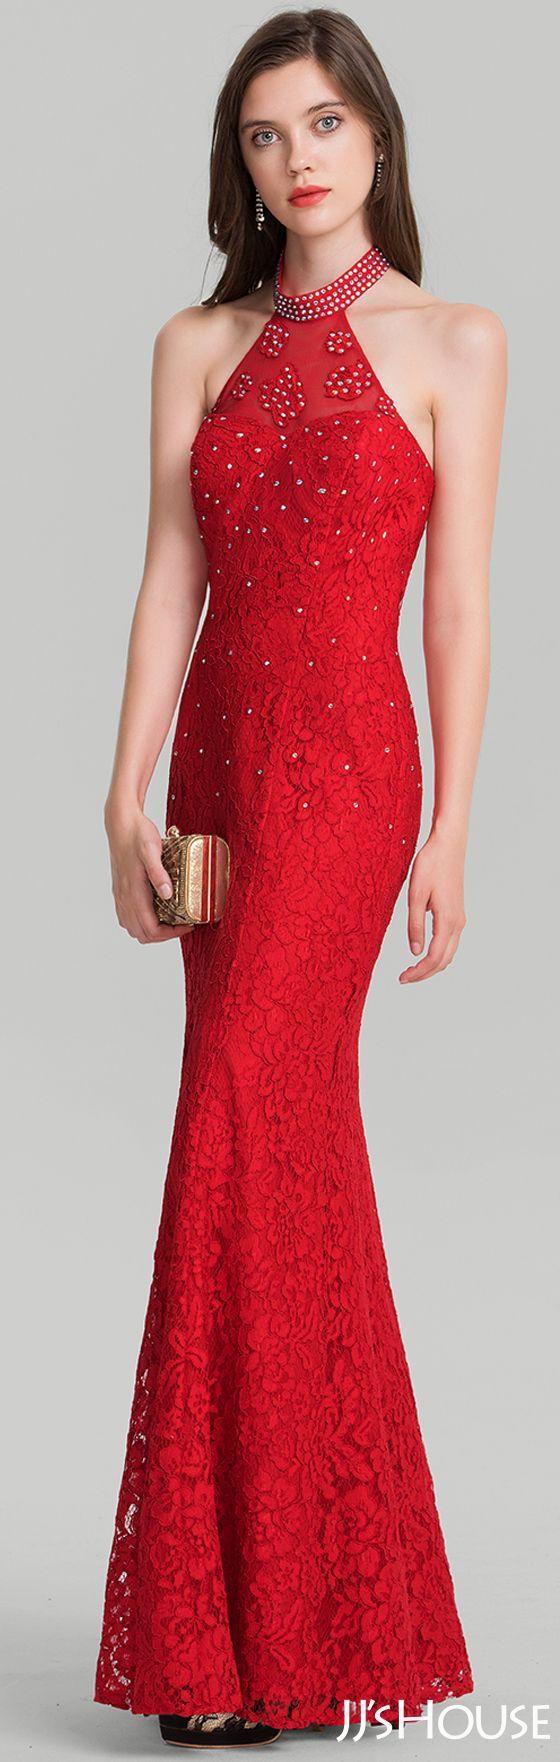 Such an amazing sheath evening dress! #JJsHouse #Evening